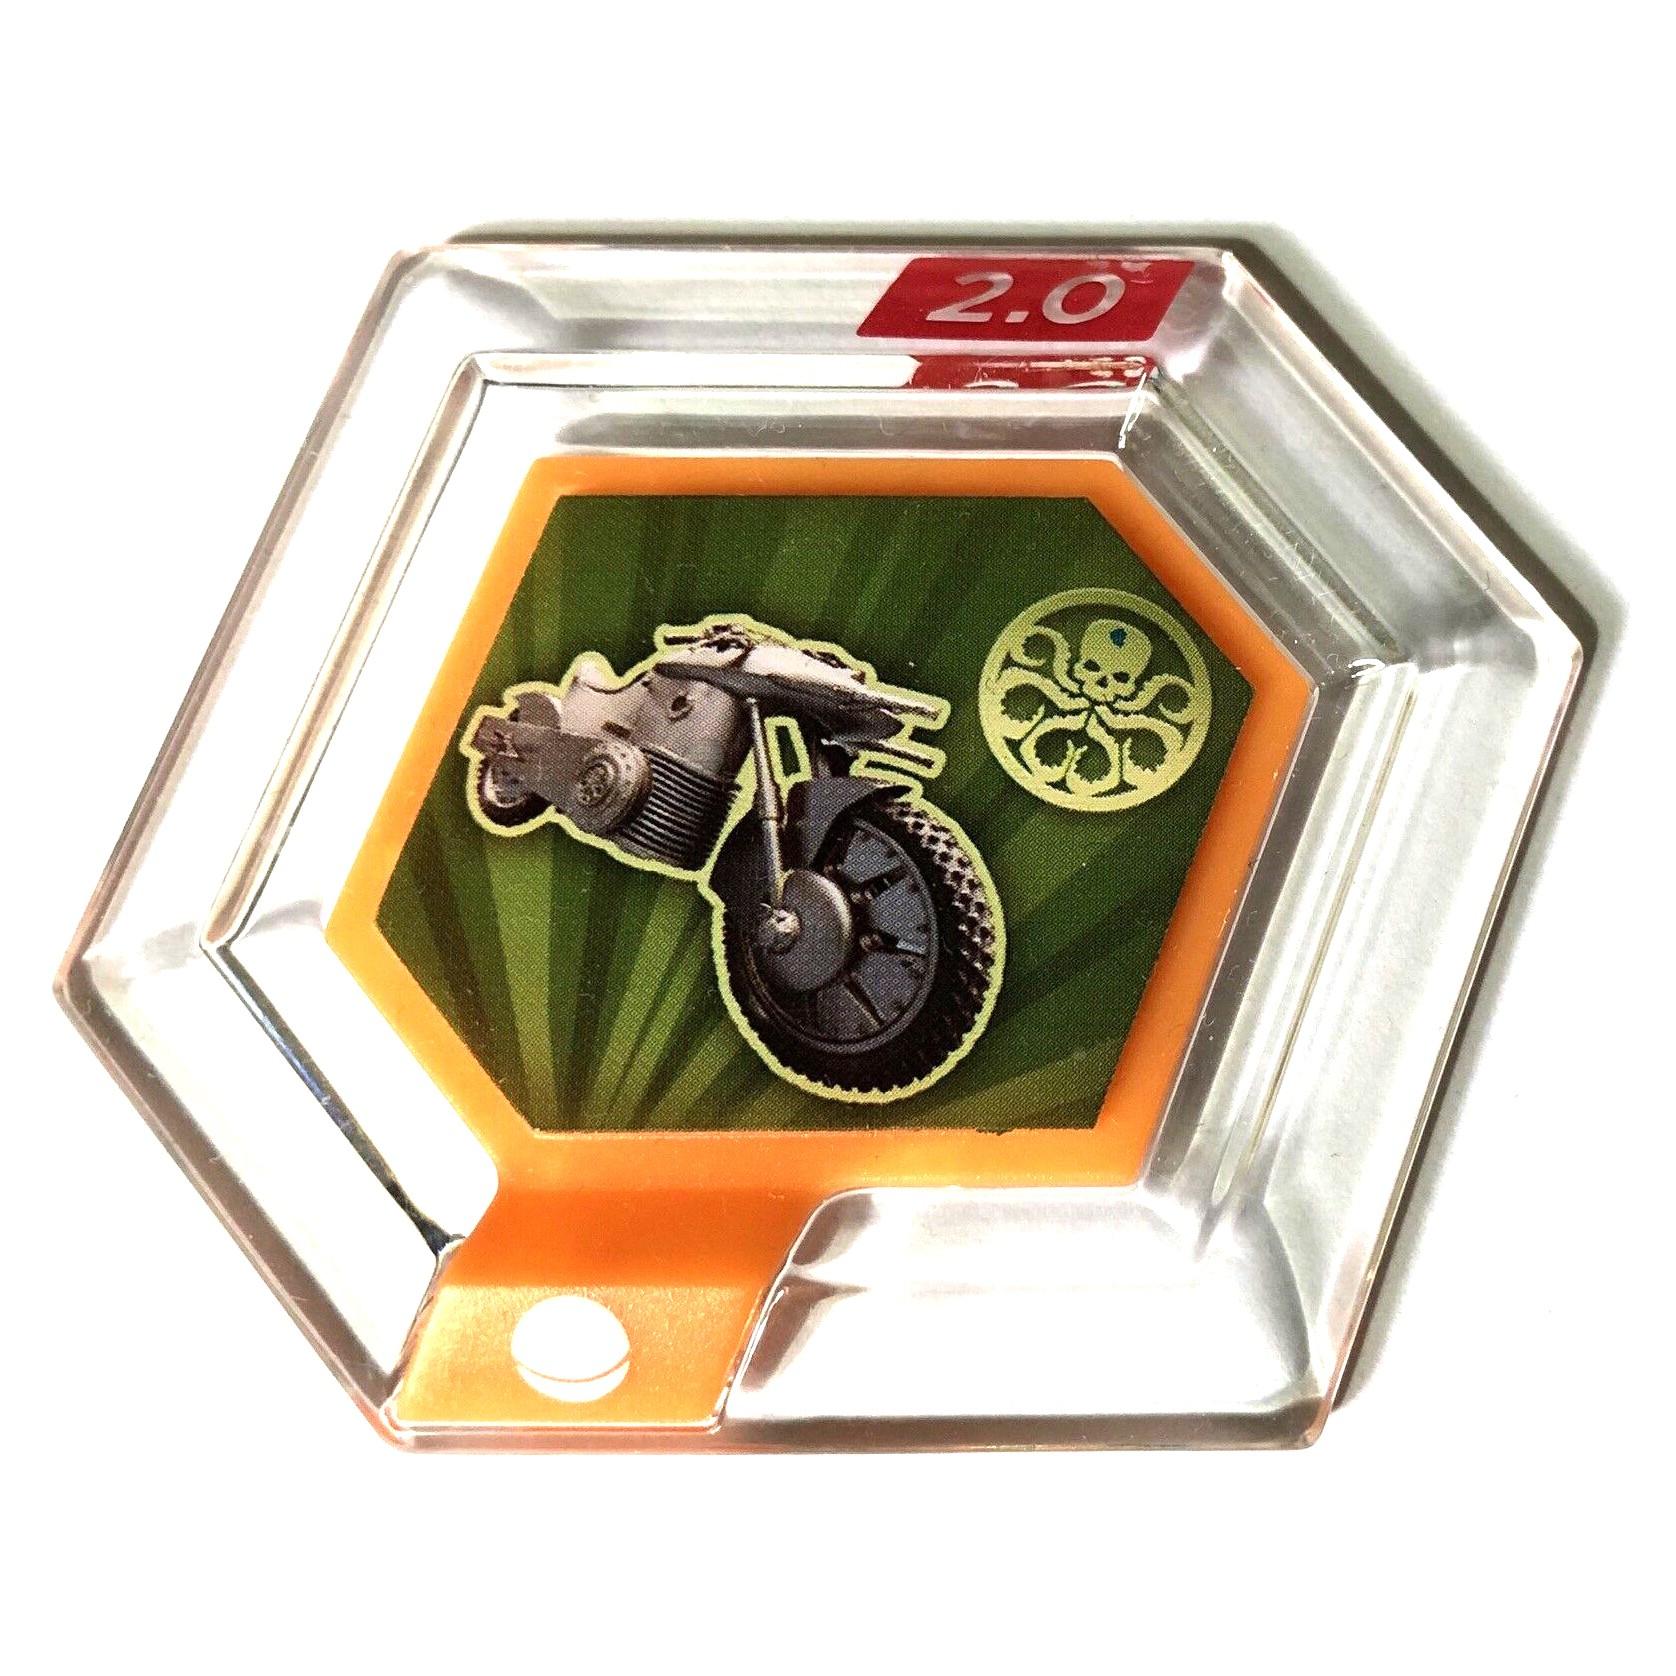 Bonus Münze / Power Disc - Hydra Motorcycle